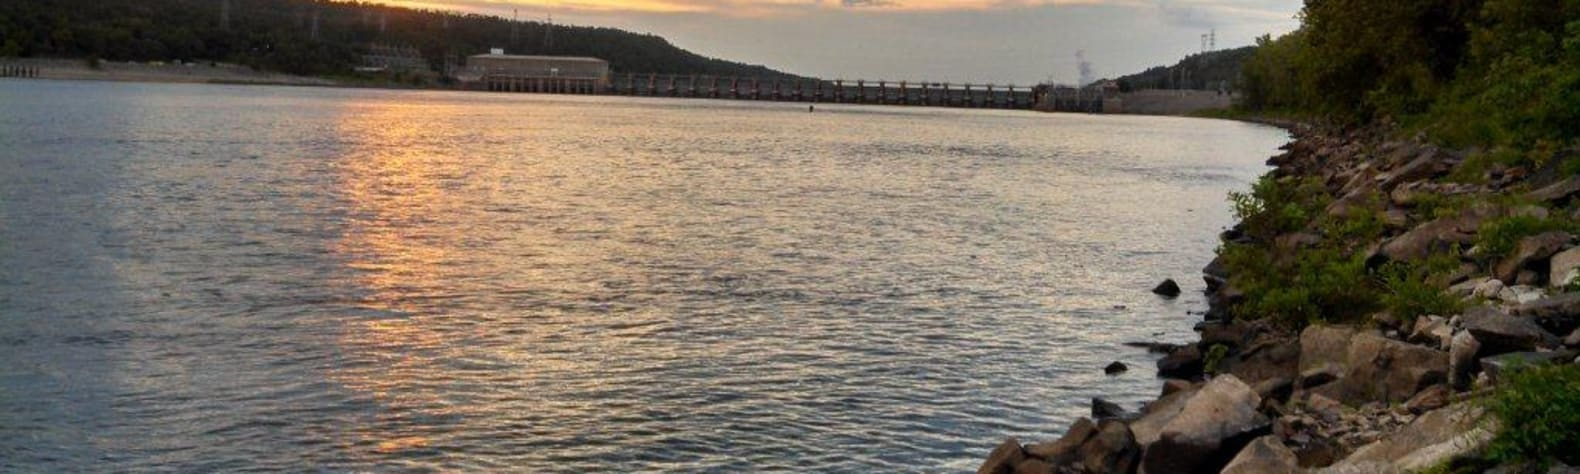 Arkansas River - David D. Terry Lock and Dam